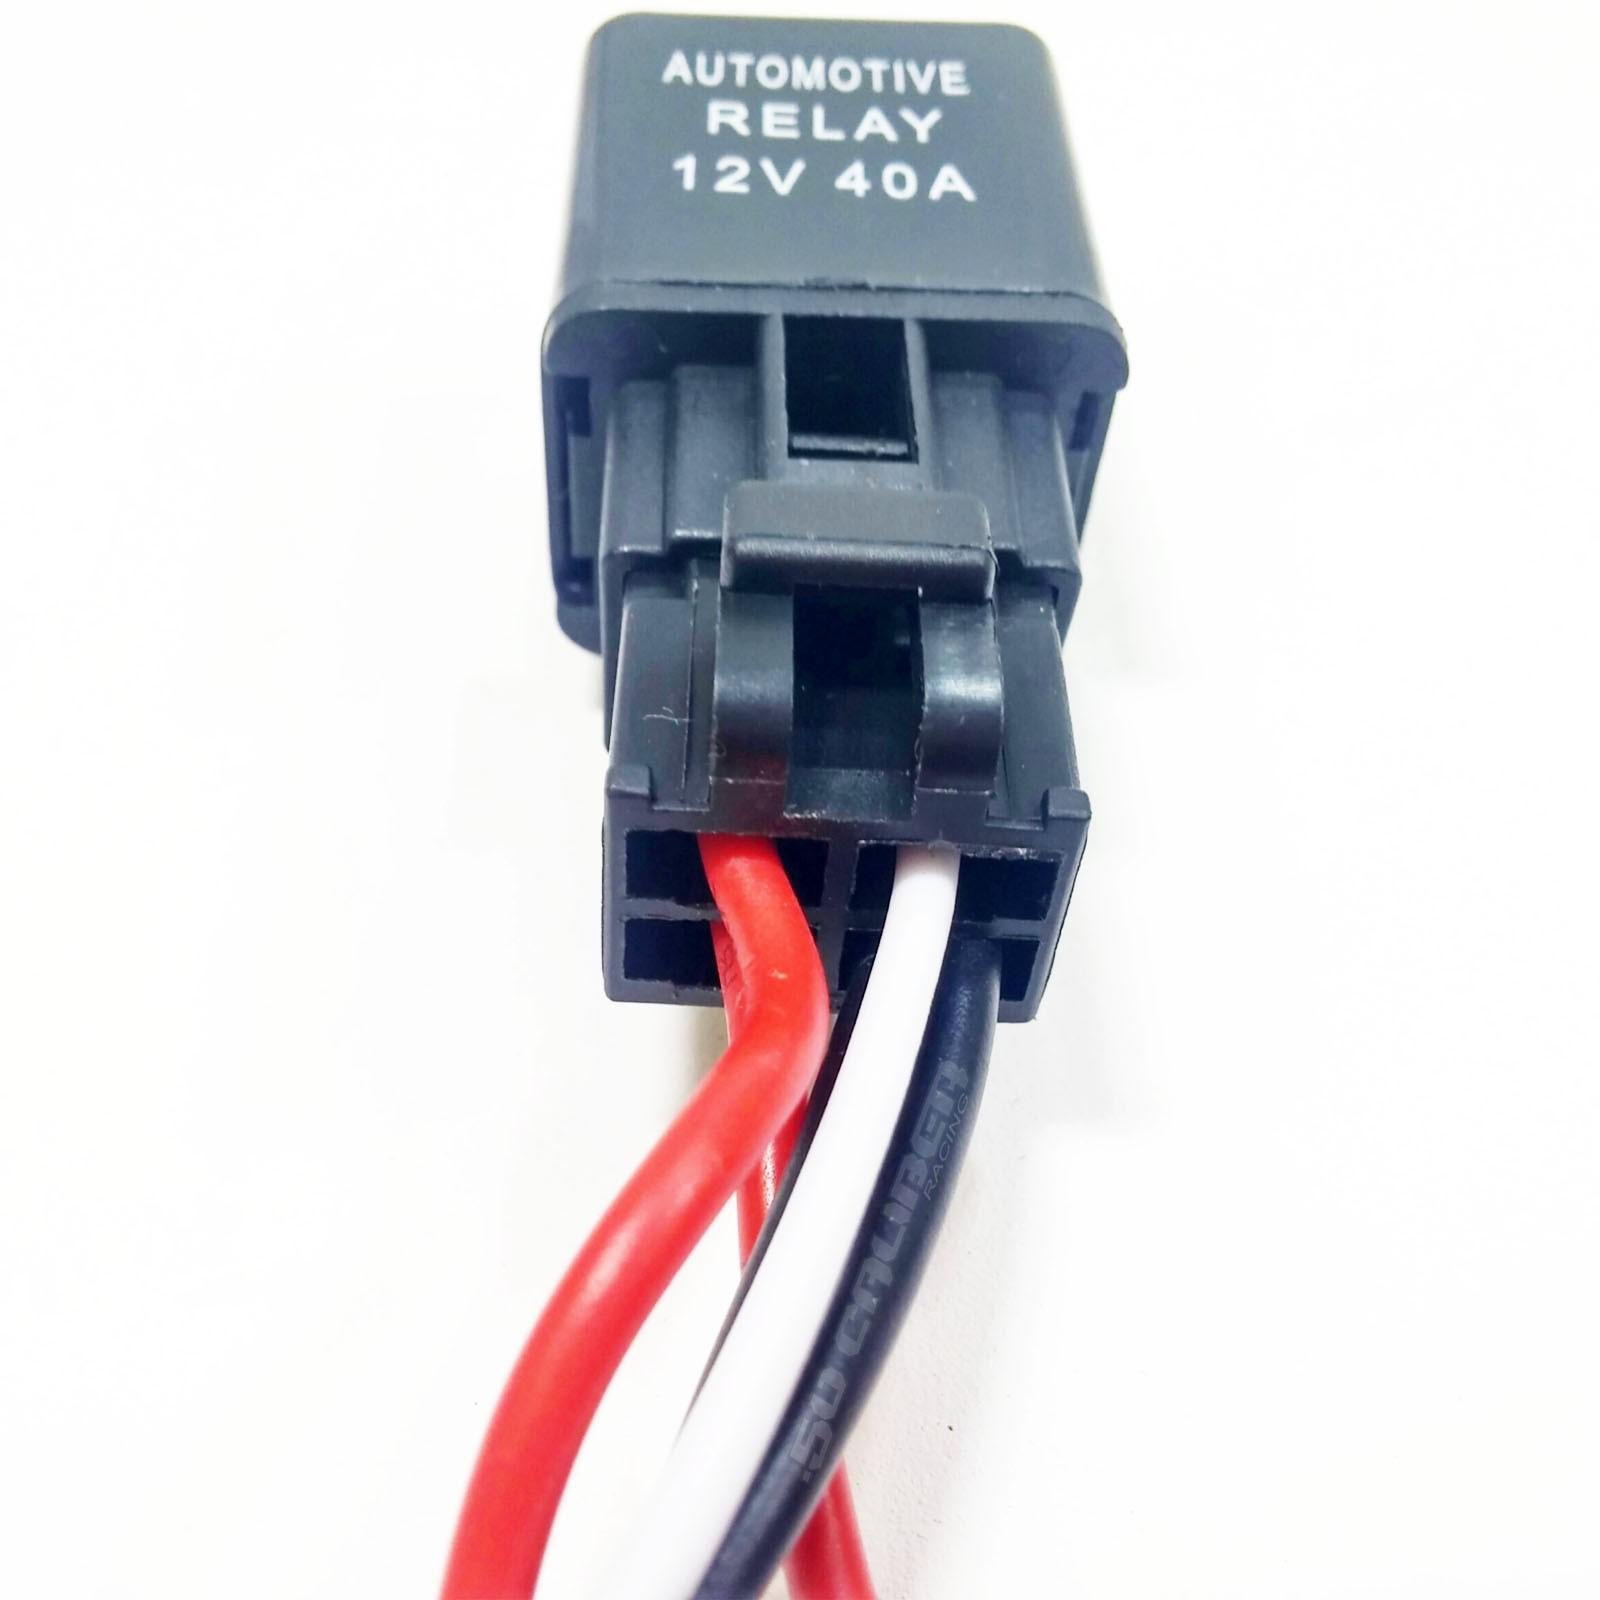 12v 30 amp relay wiring diagram 2000 suzuki hayabusa 40a wire ignition switch